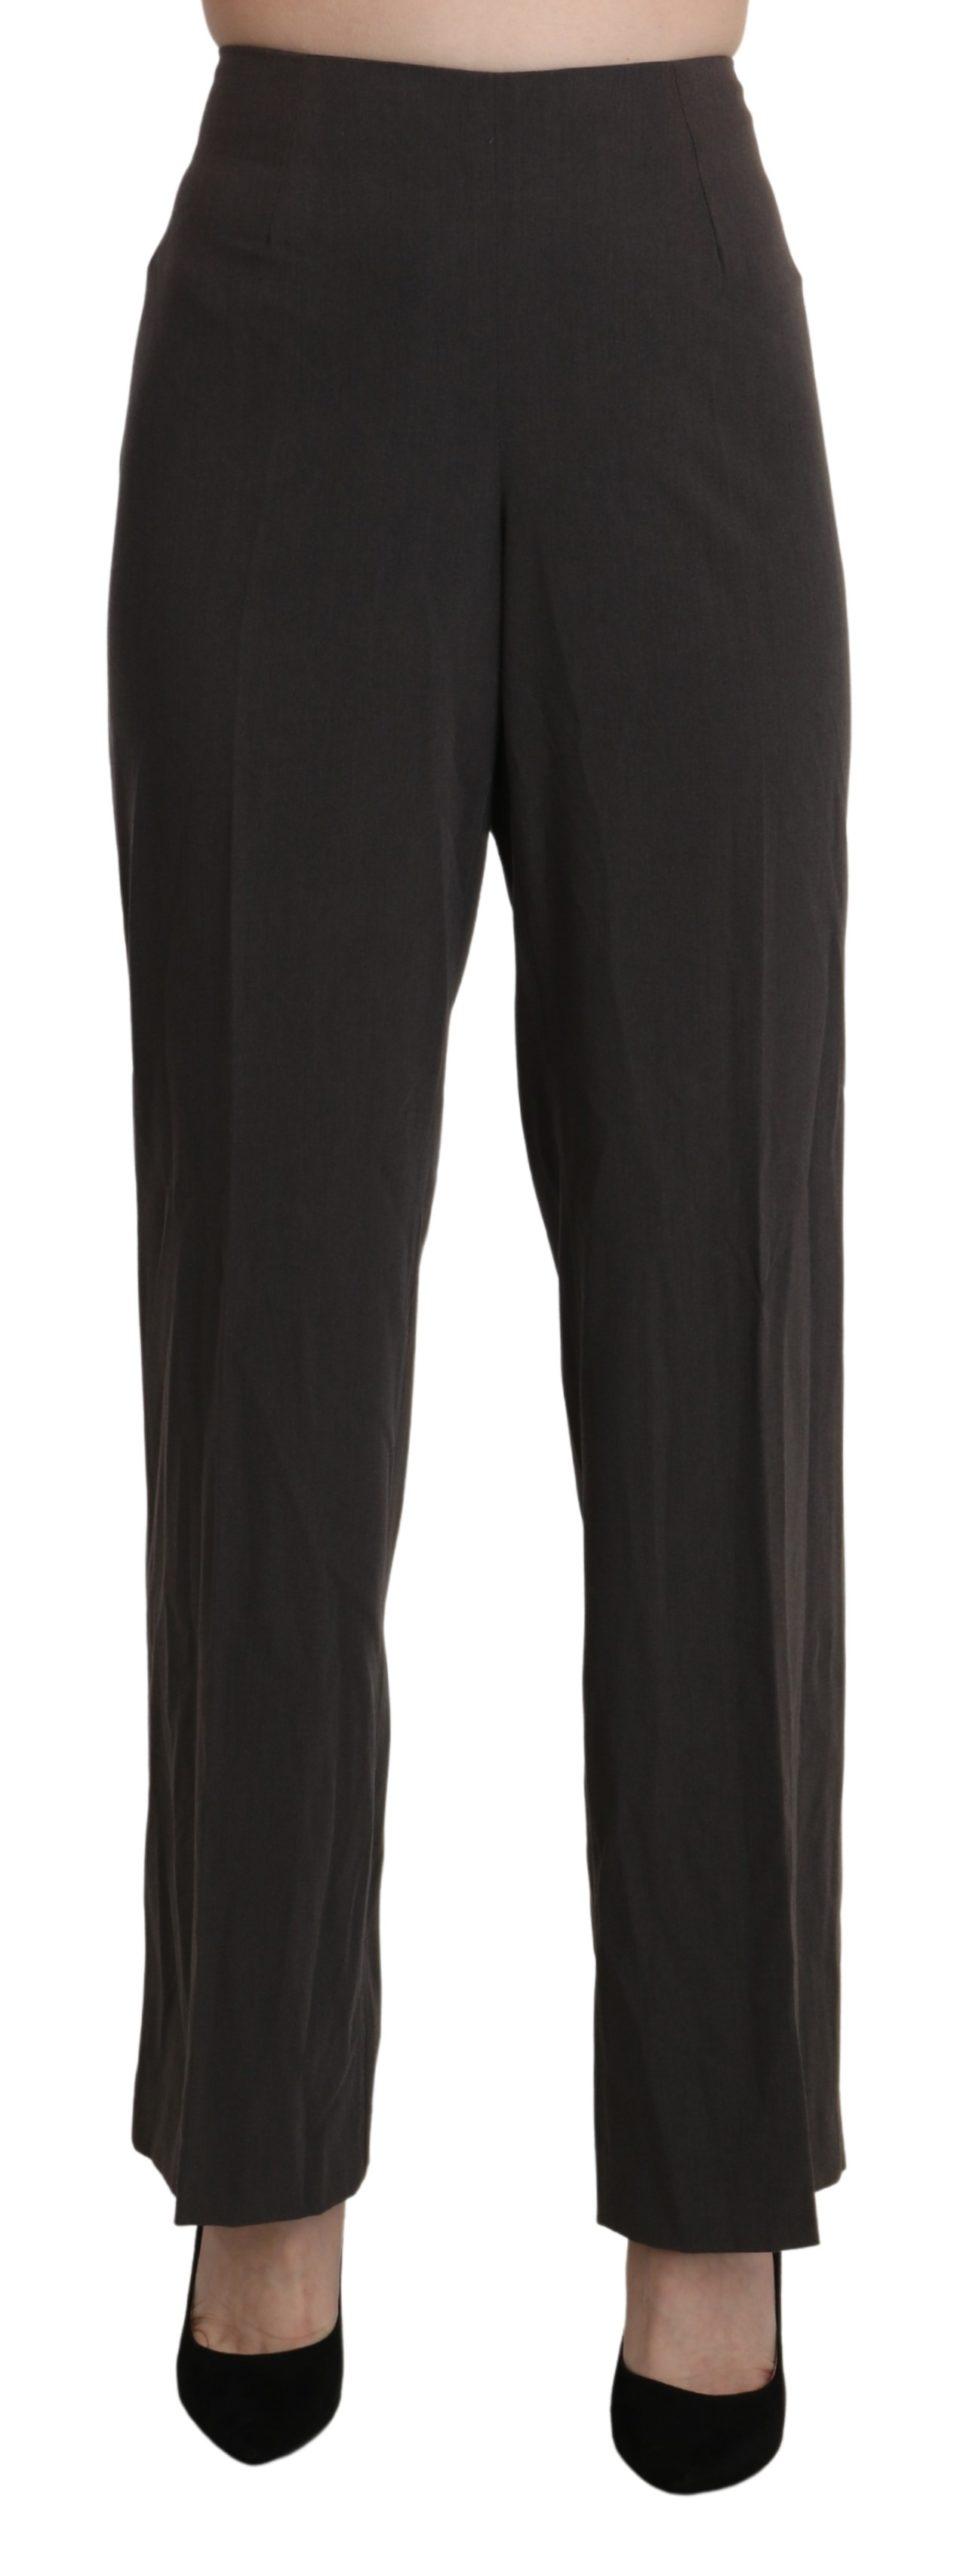 BENCIVENGA Women's High Waist Straight Trousers Grey PAN71339-48 - IT48|XXL